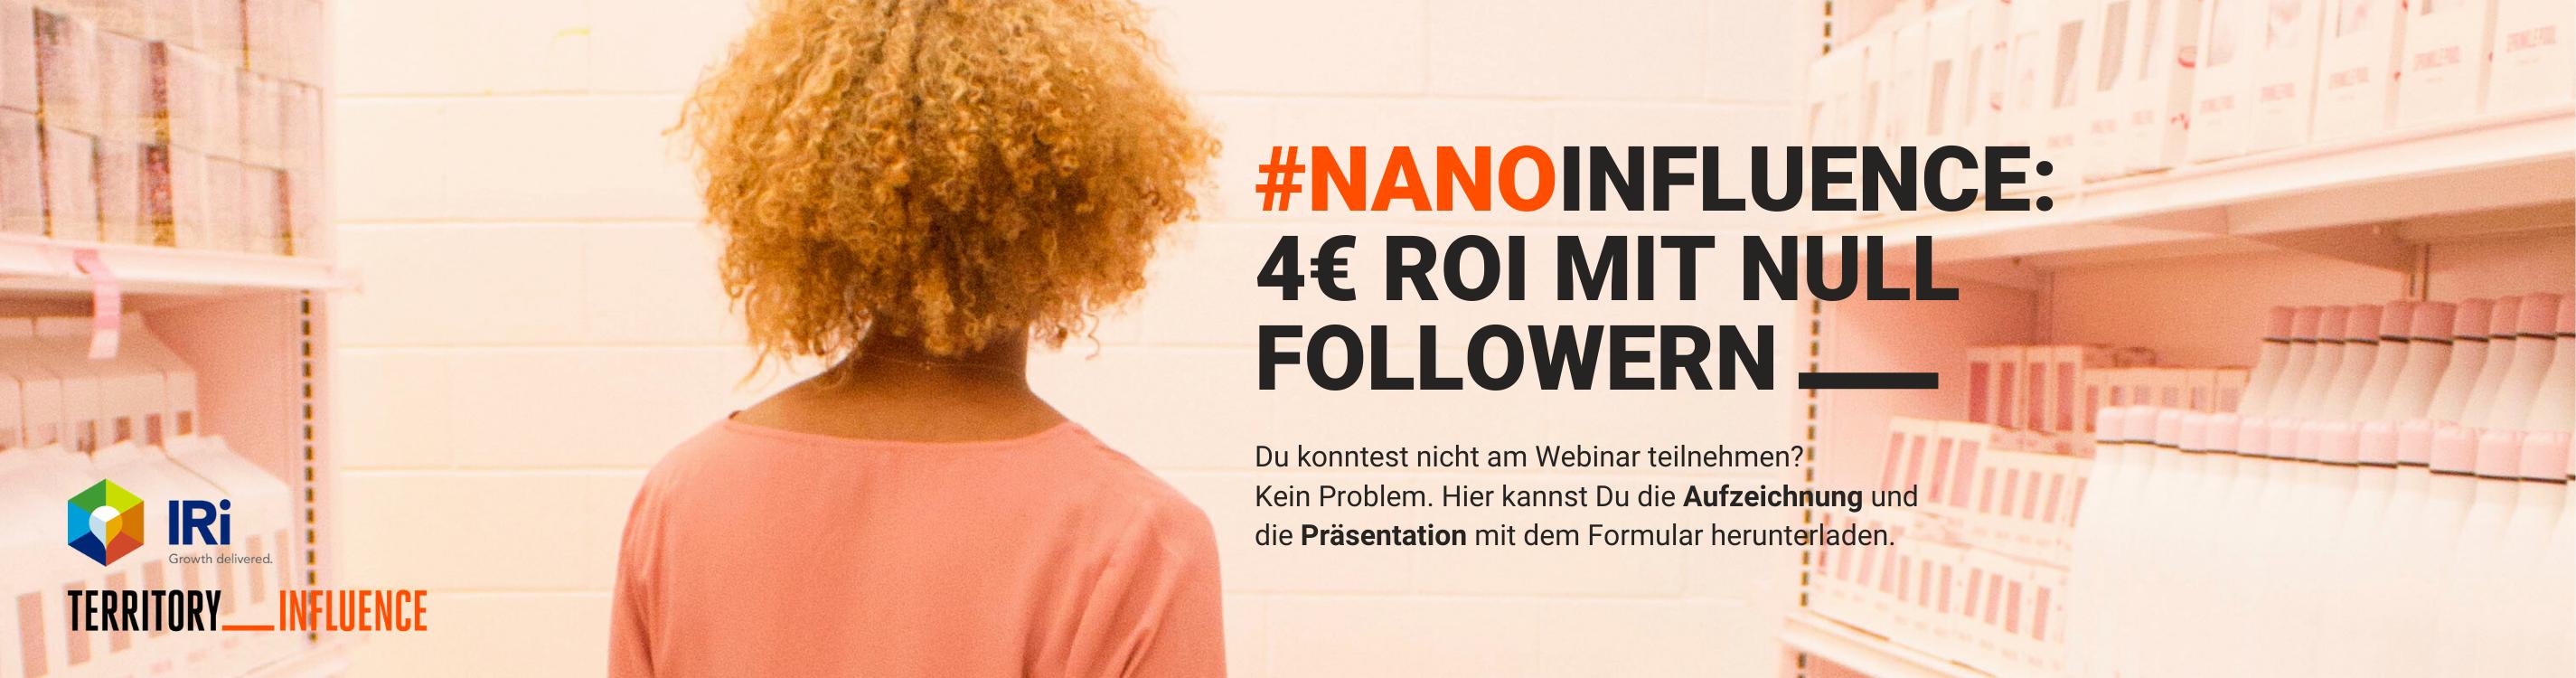 INT_LP_HeaderVisual_NANO-2